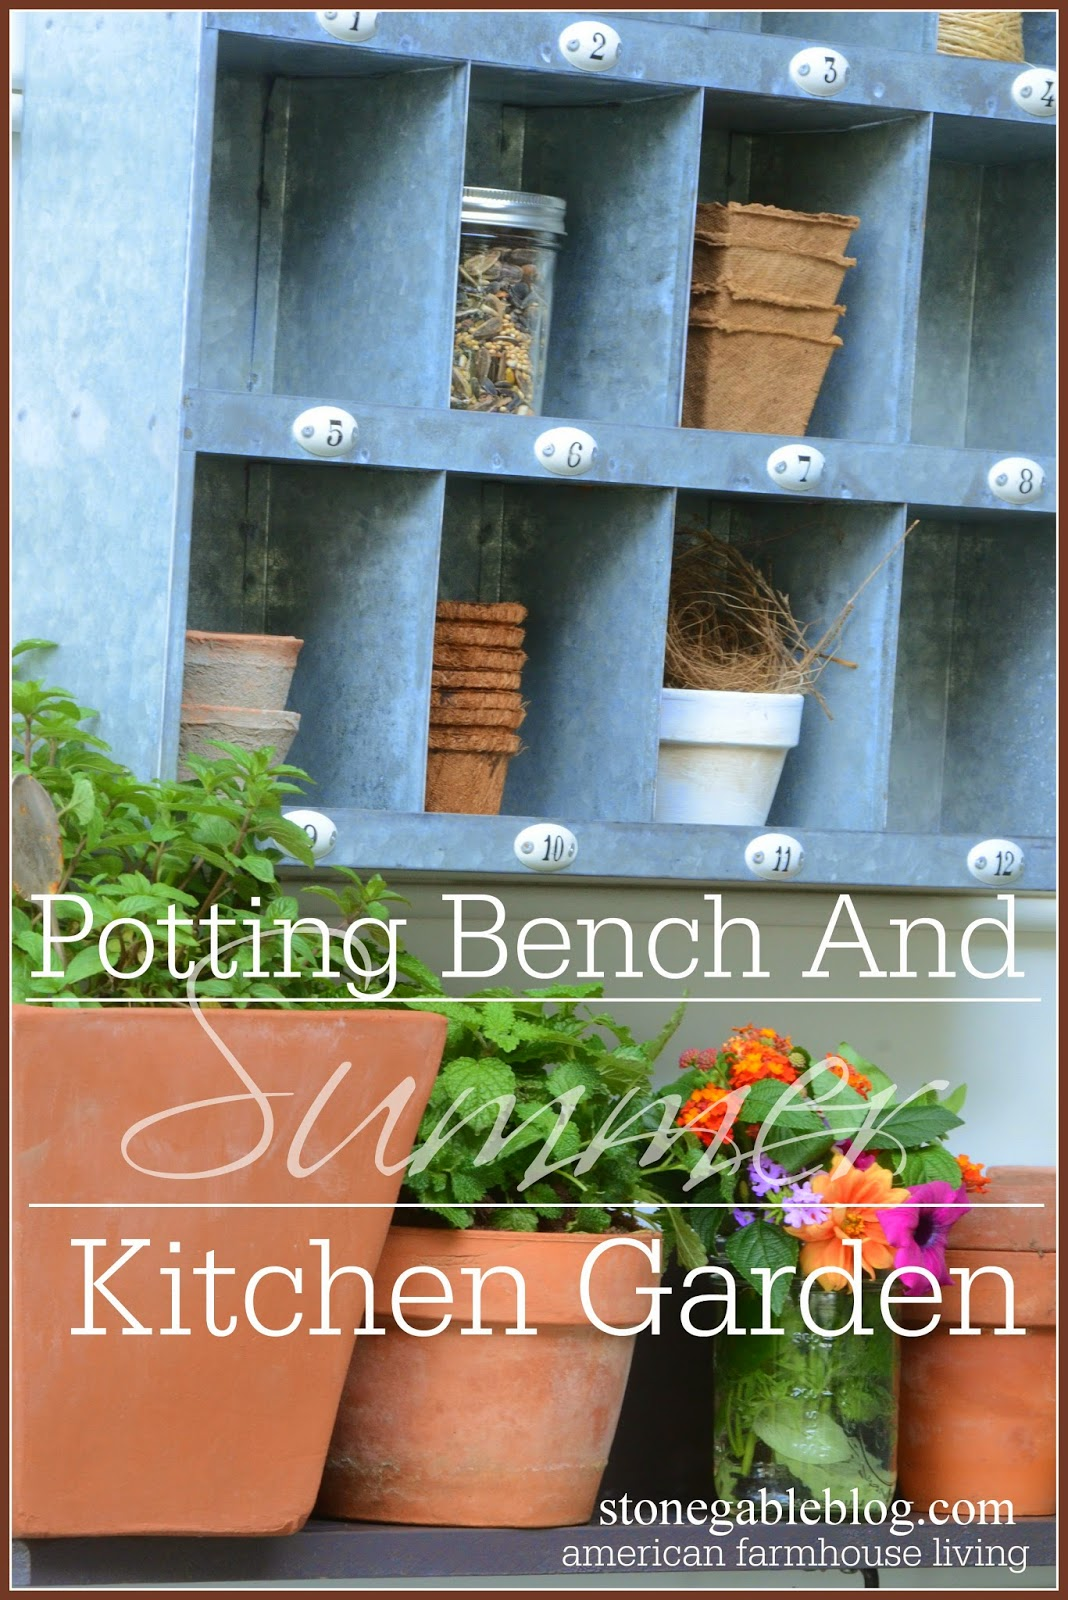 Potting-bench-TITLE PAGE-stonegableblog.com